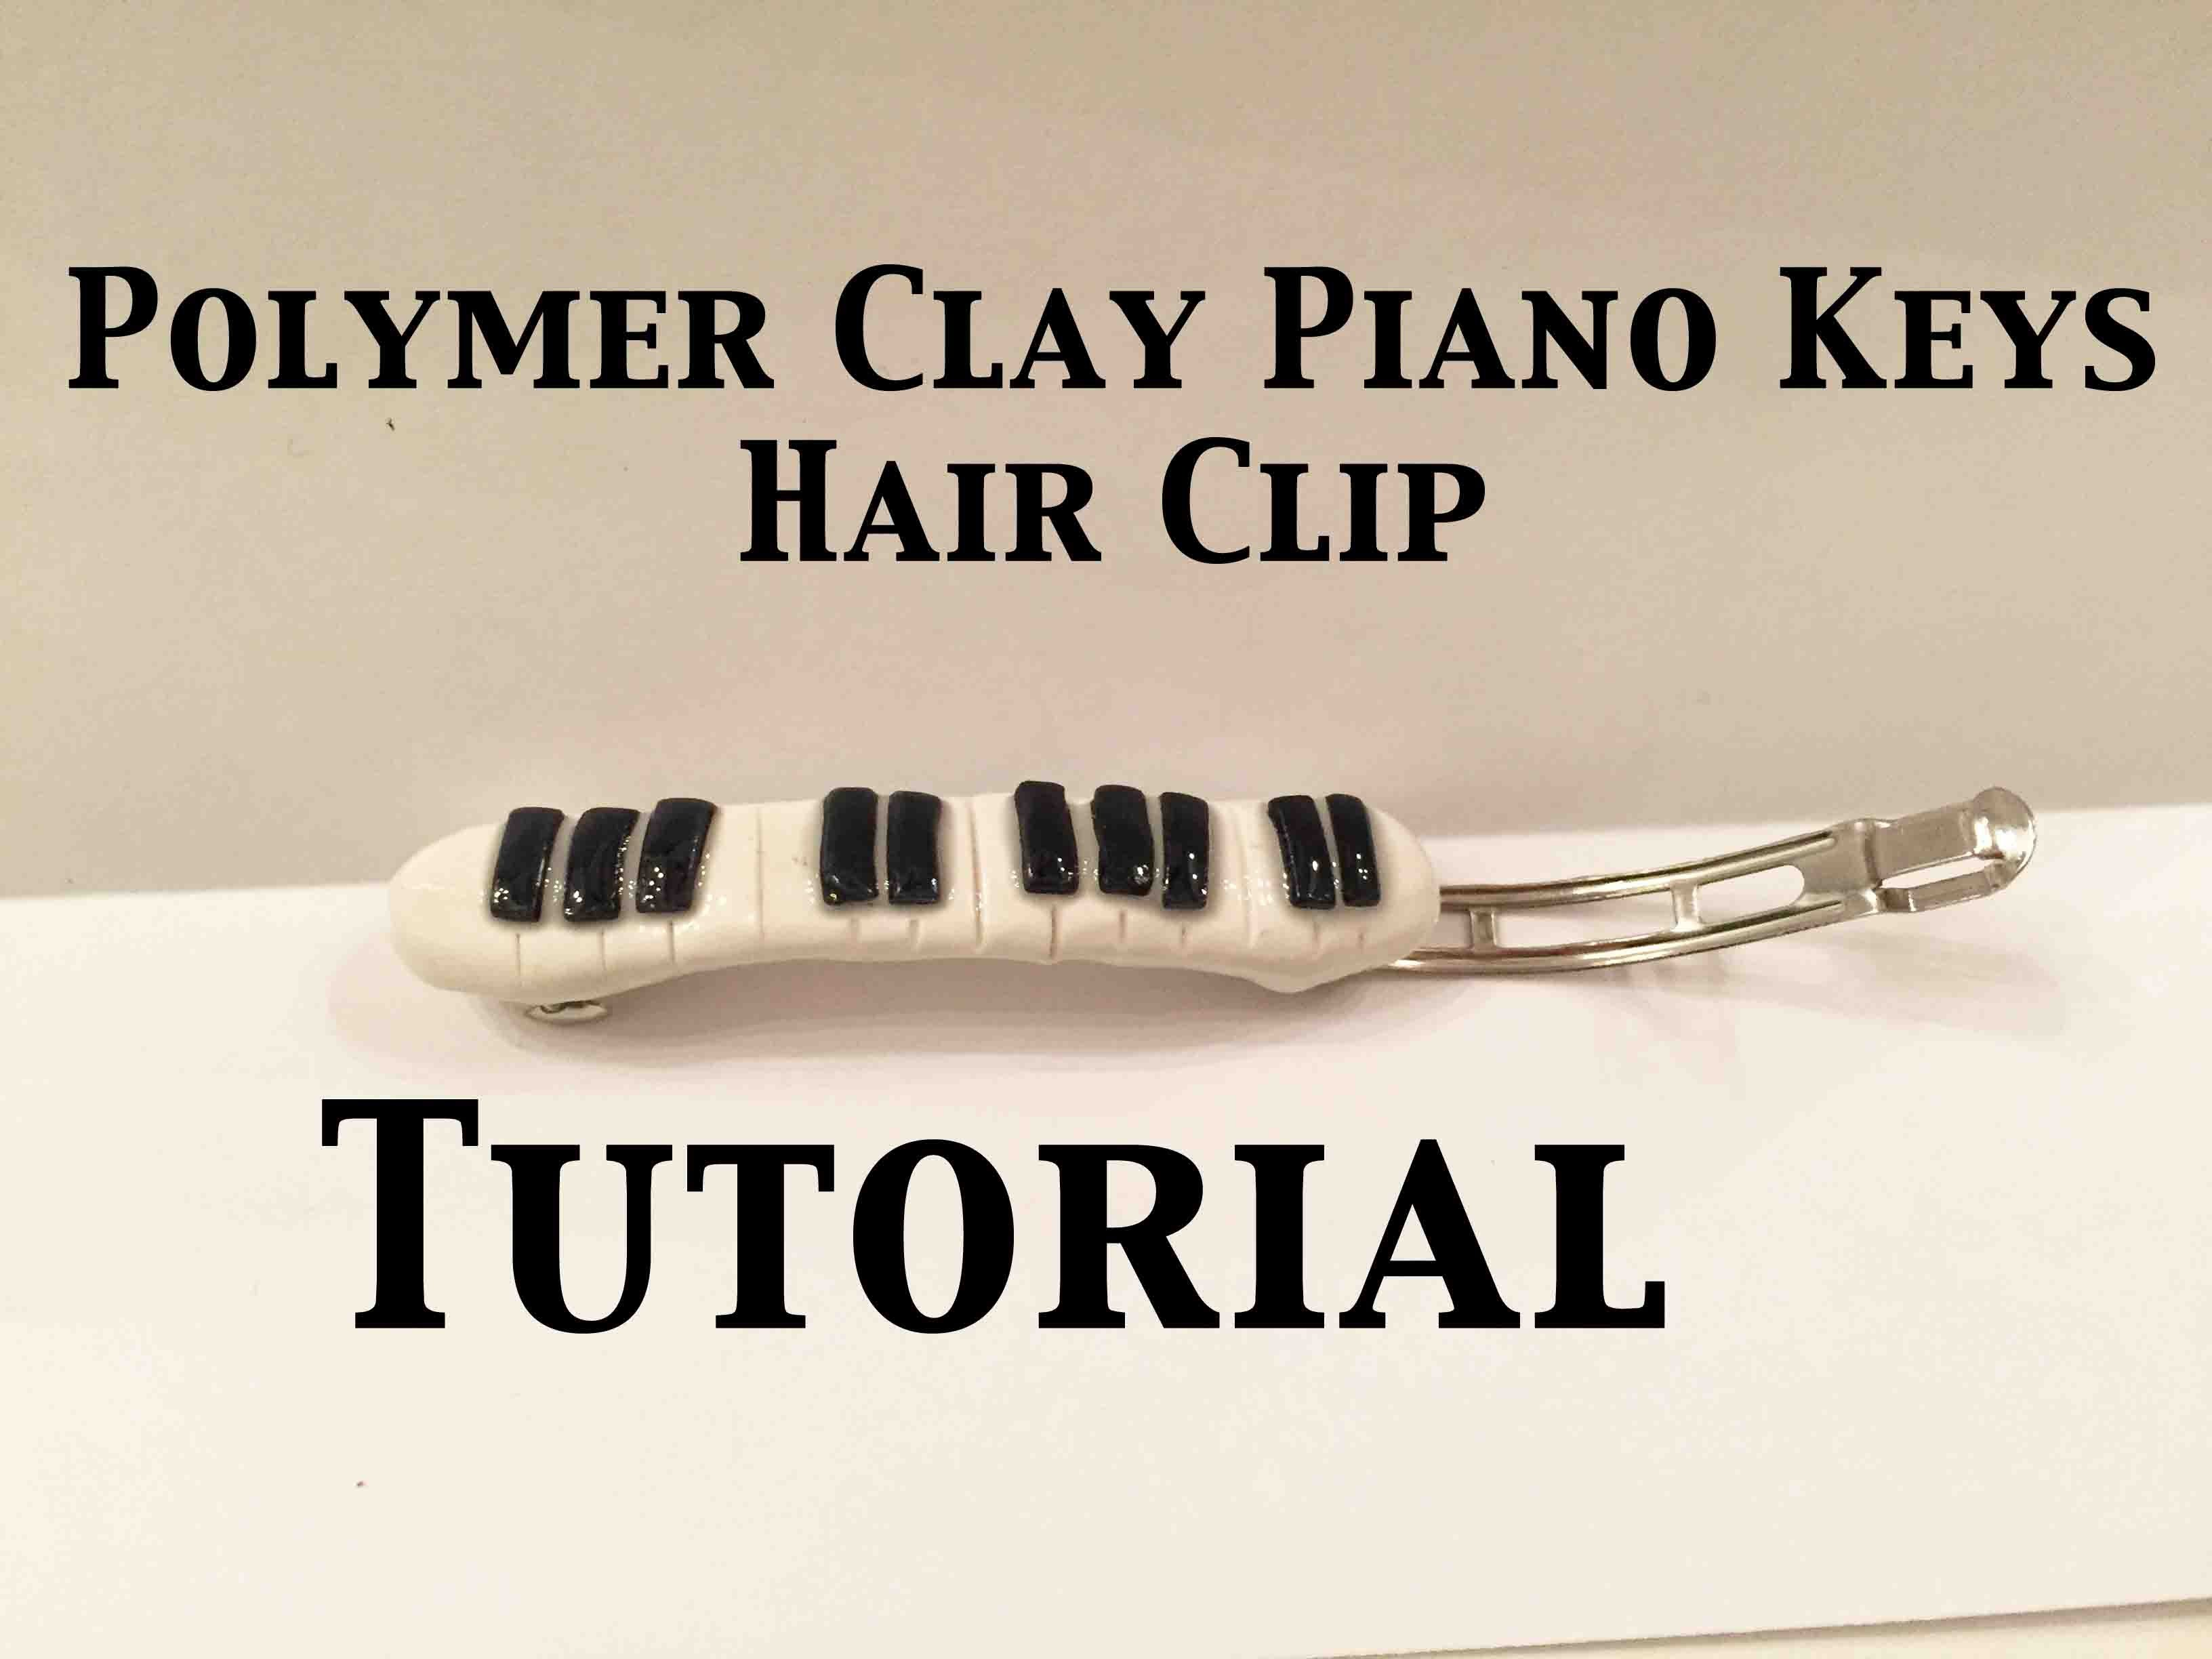 Polymer Clay Piano Keys Hair Clip Tutorial